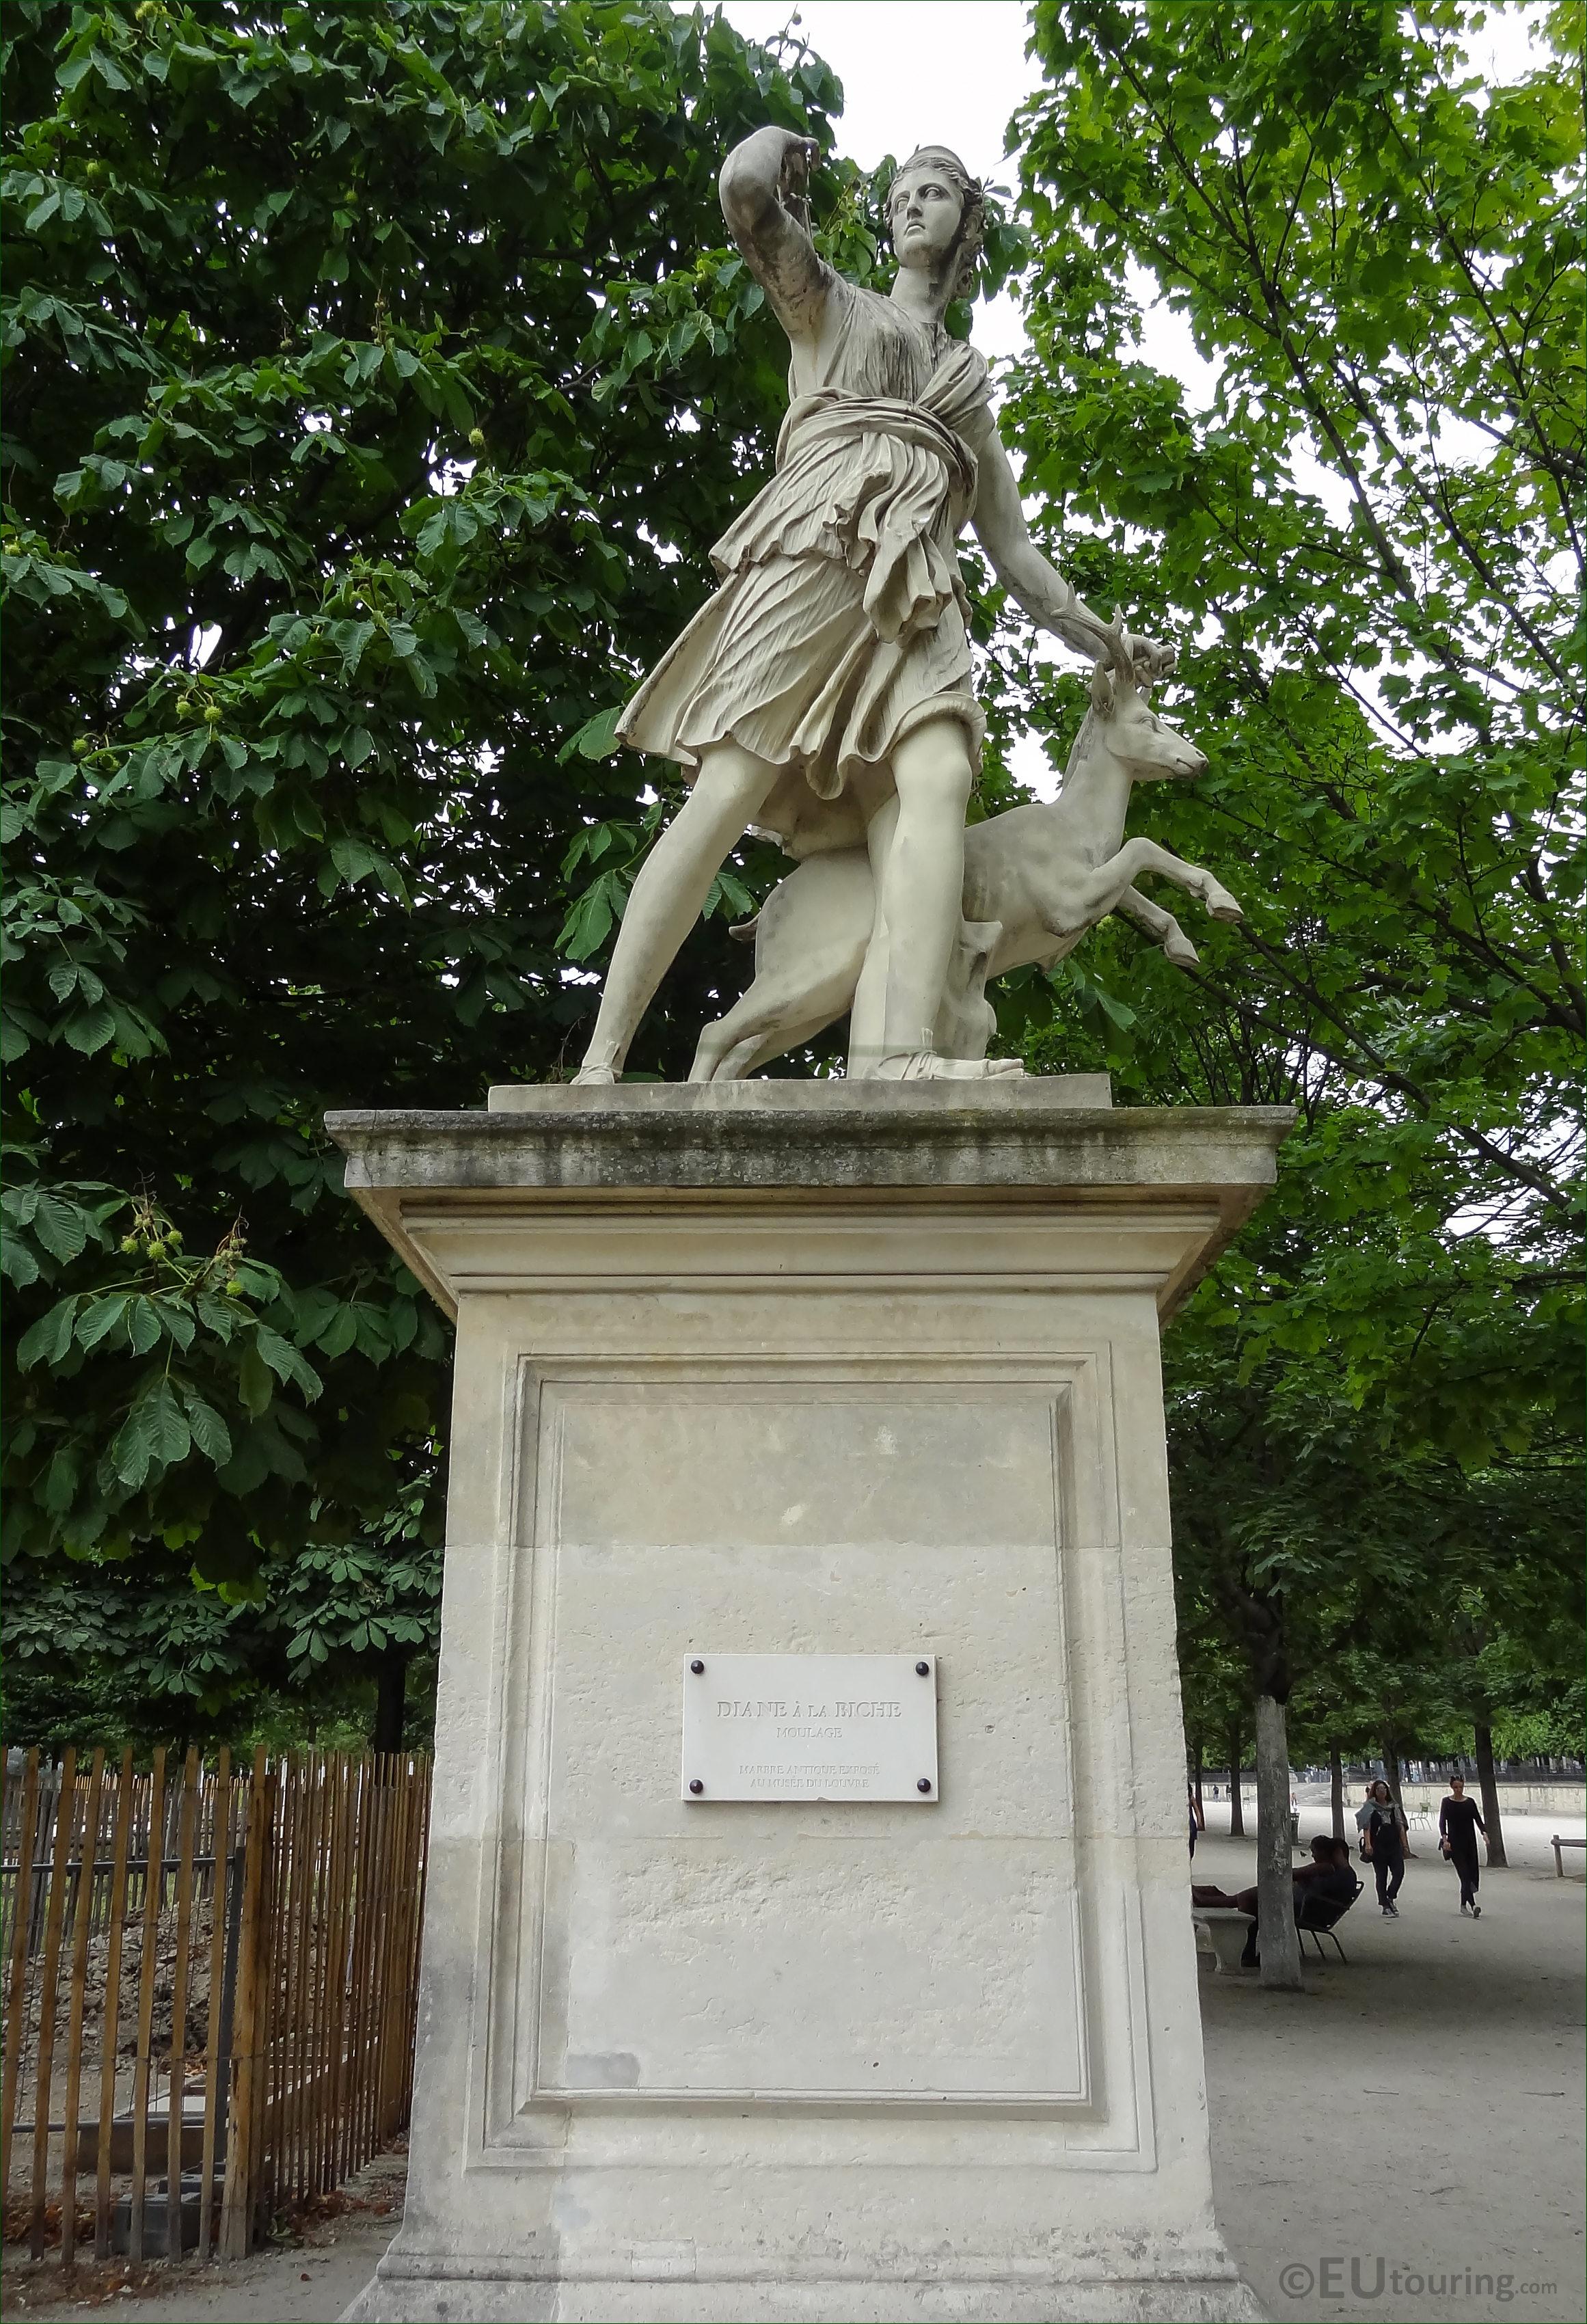 Photos of diane a la biche statue in jardin des tuileries page 679 - Statue jardin ...